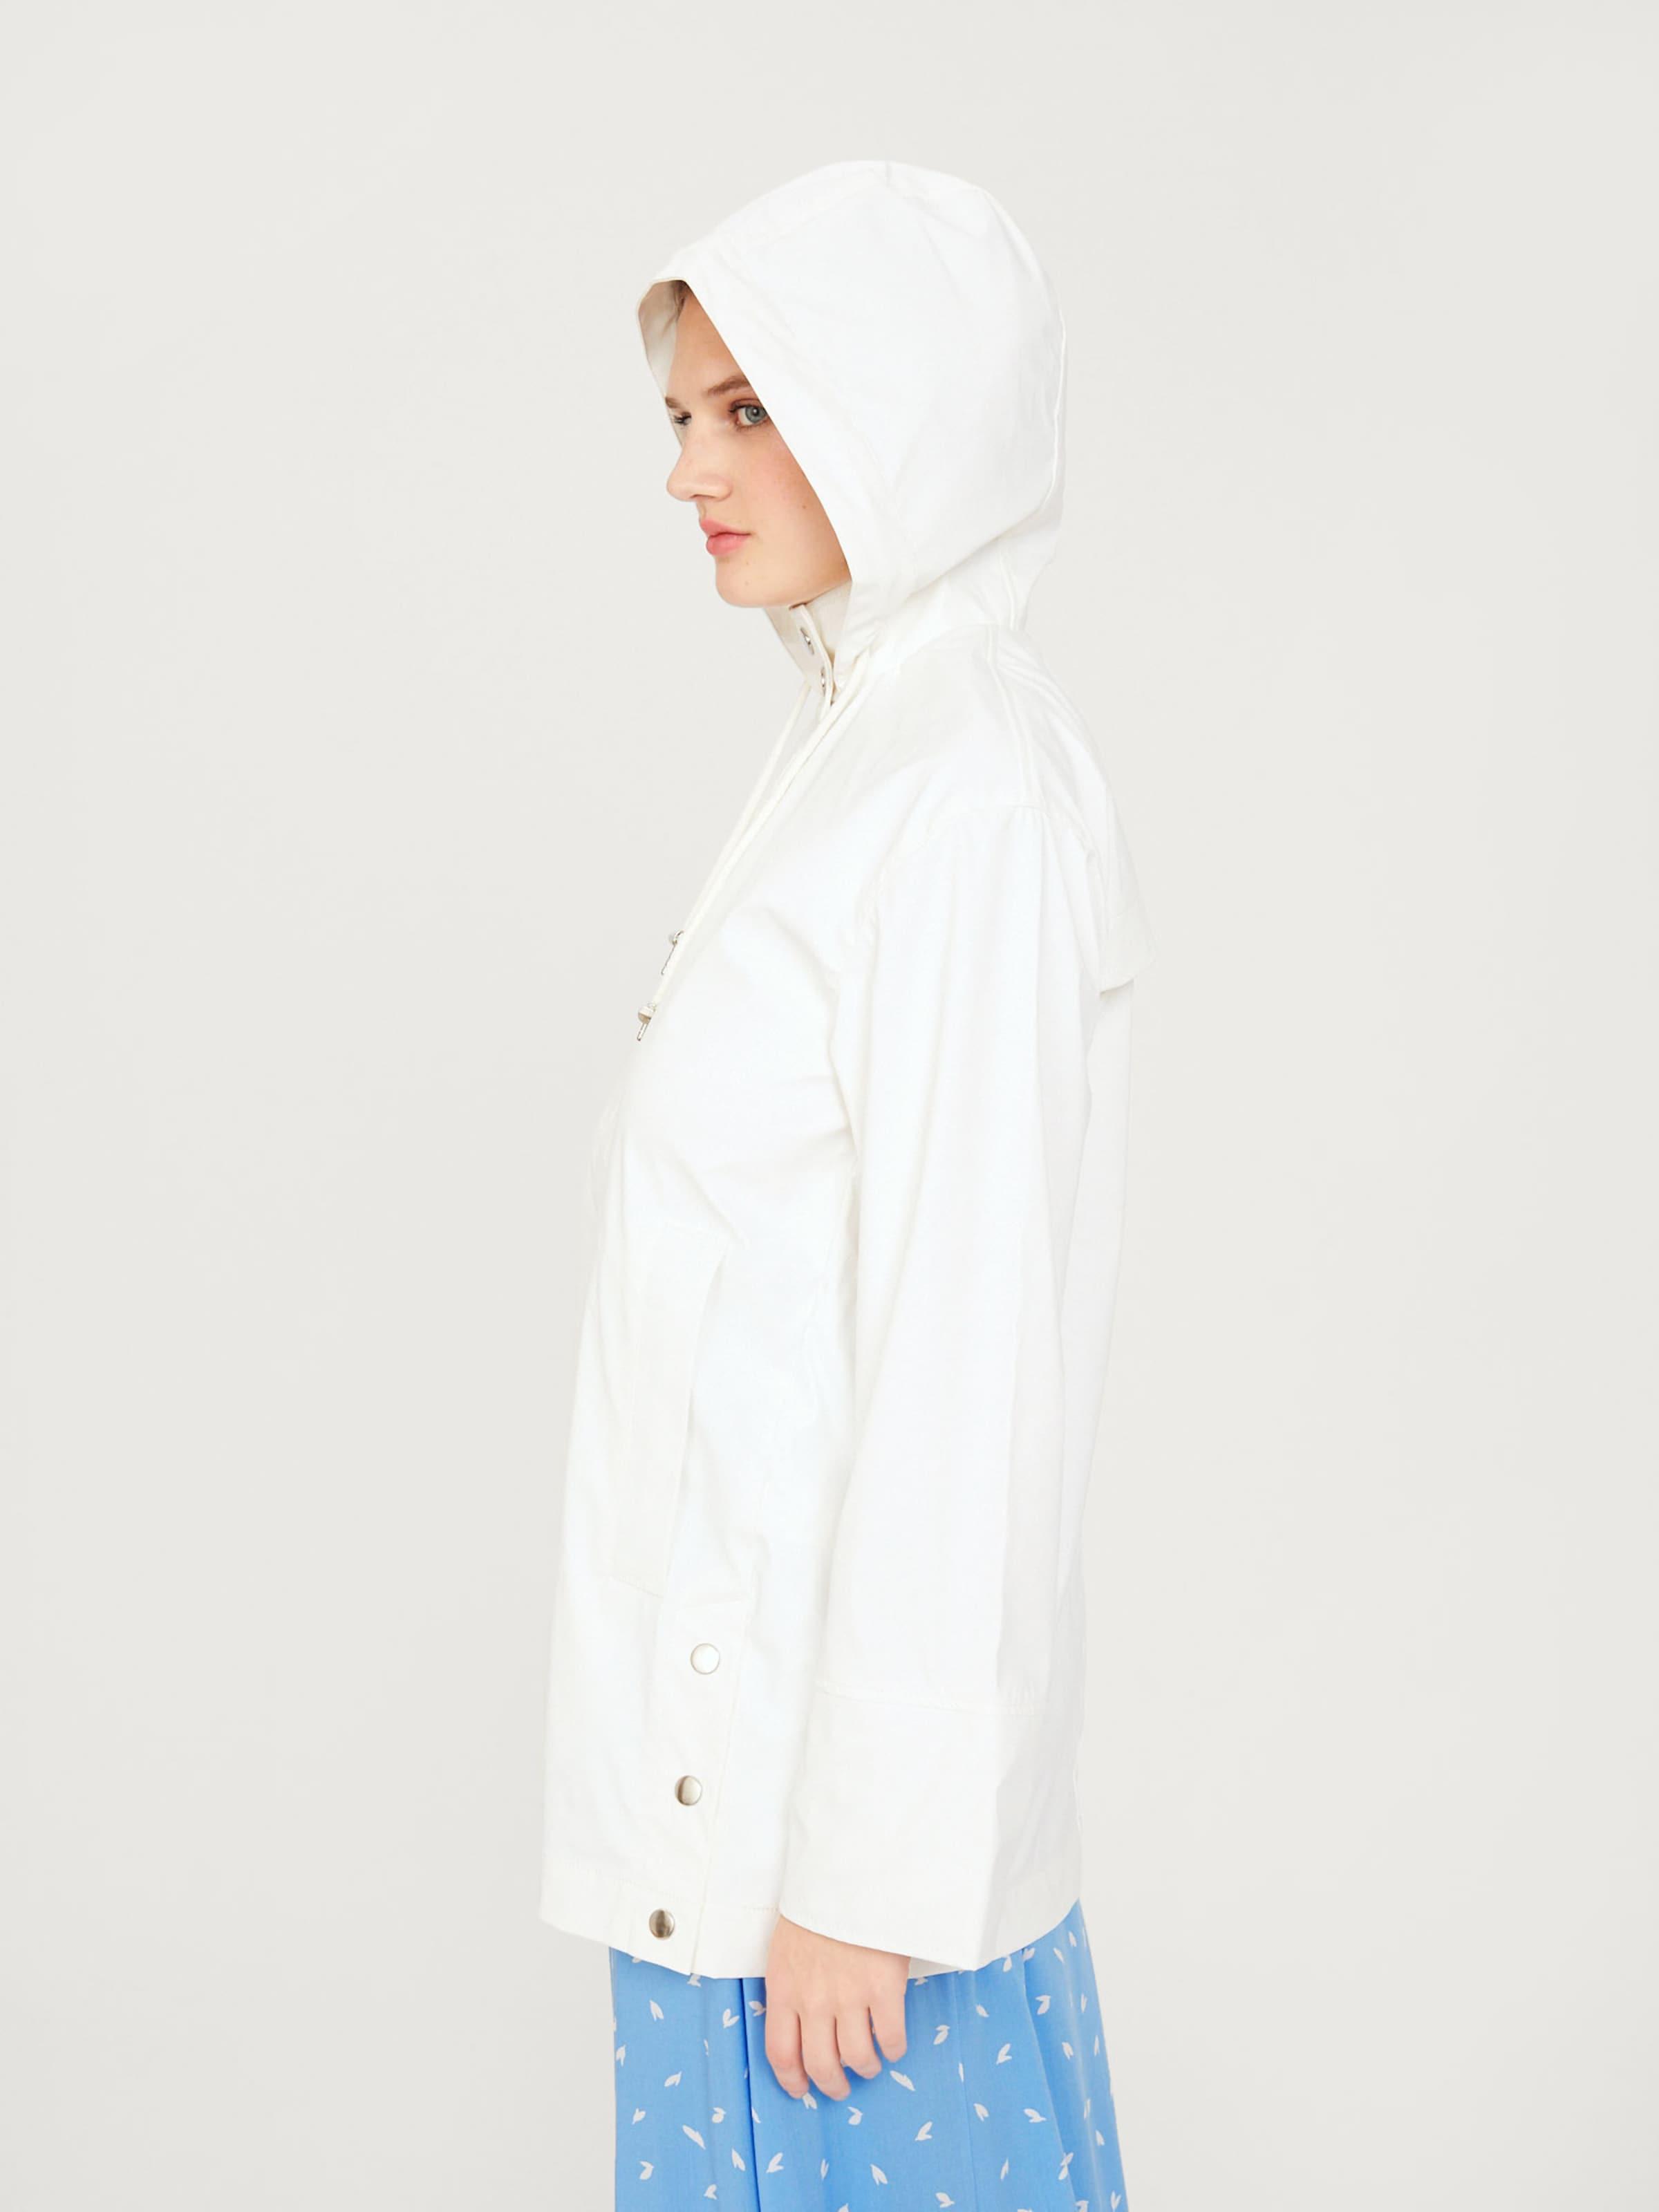 'nahla' Edited Veste Fonctionnelle Blanc En eE9IbH2DYW